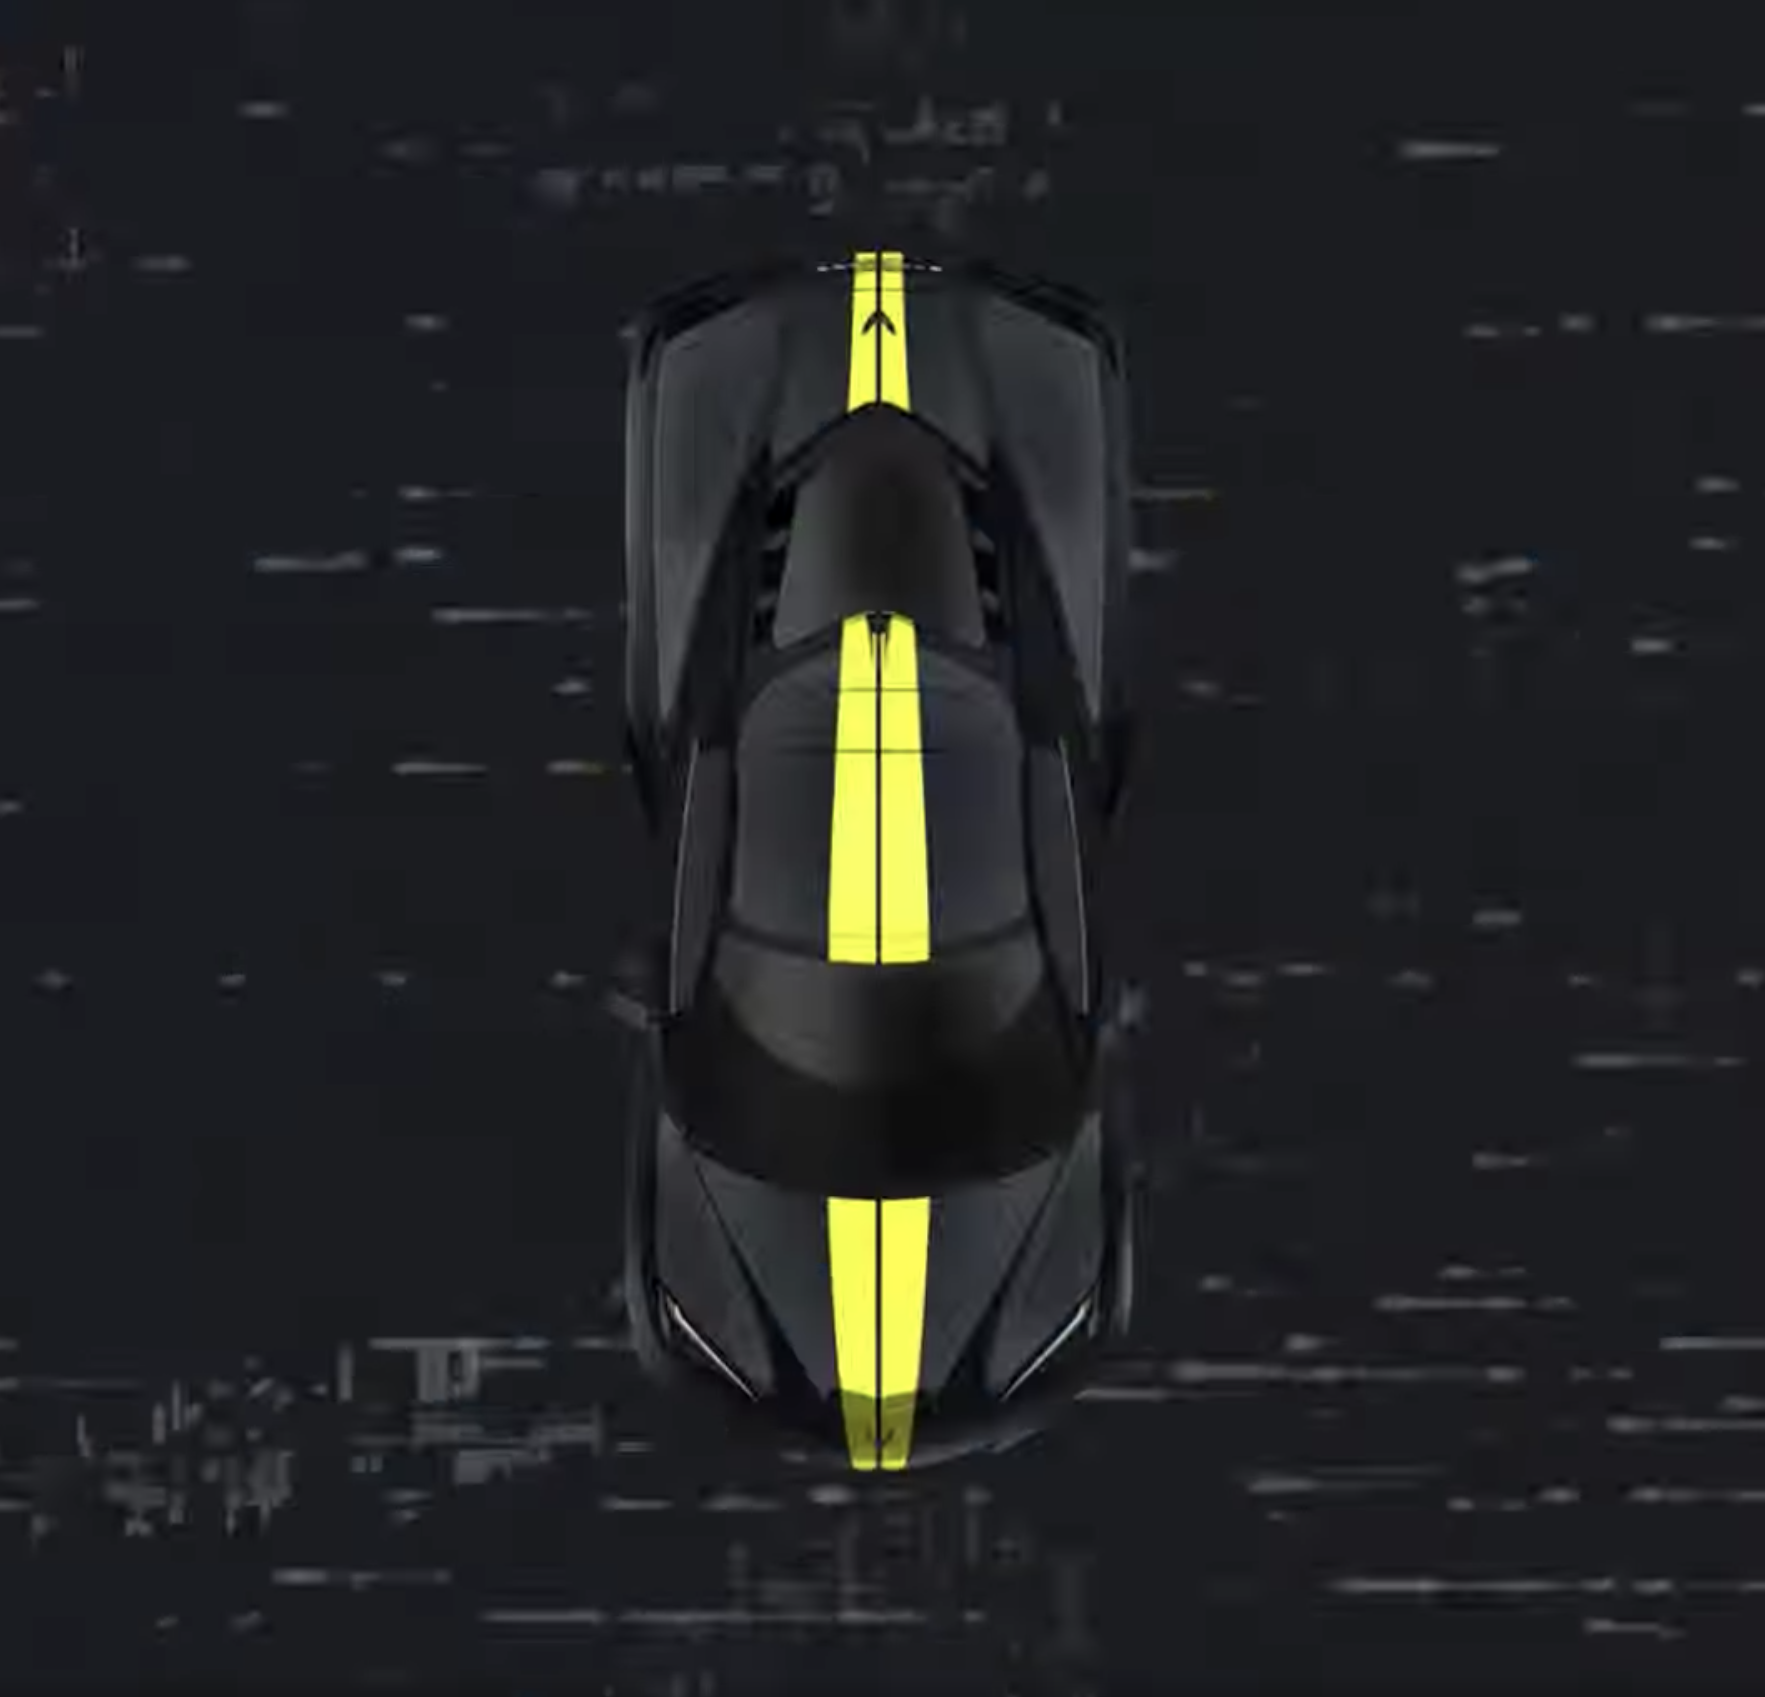 2021 Corvette C8 graphics stripes